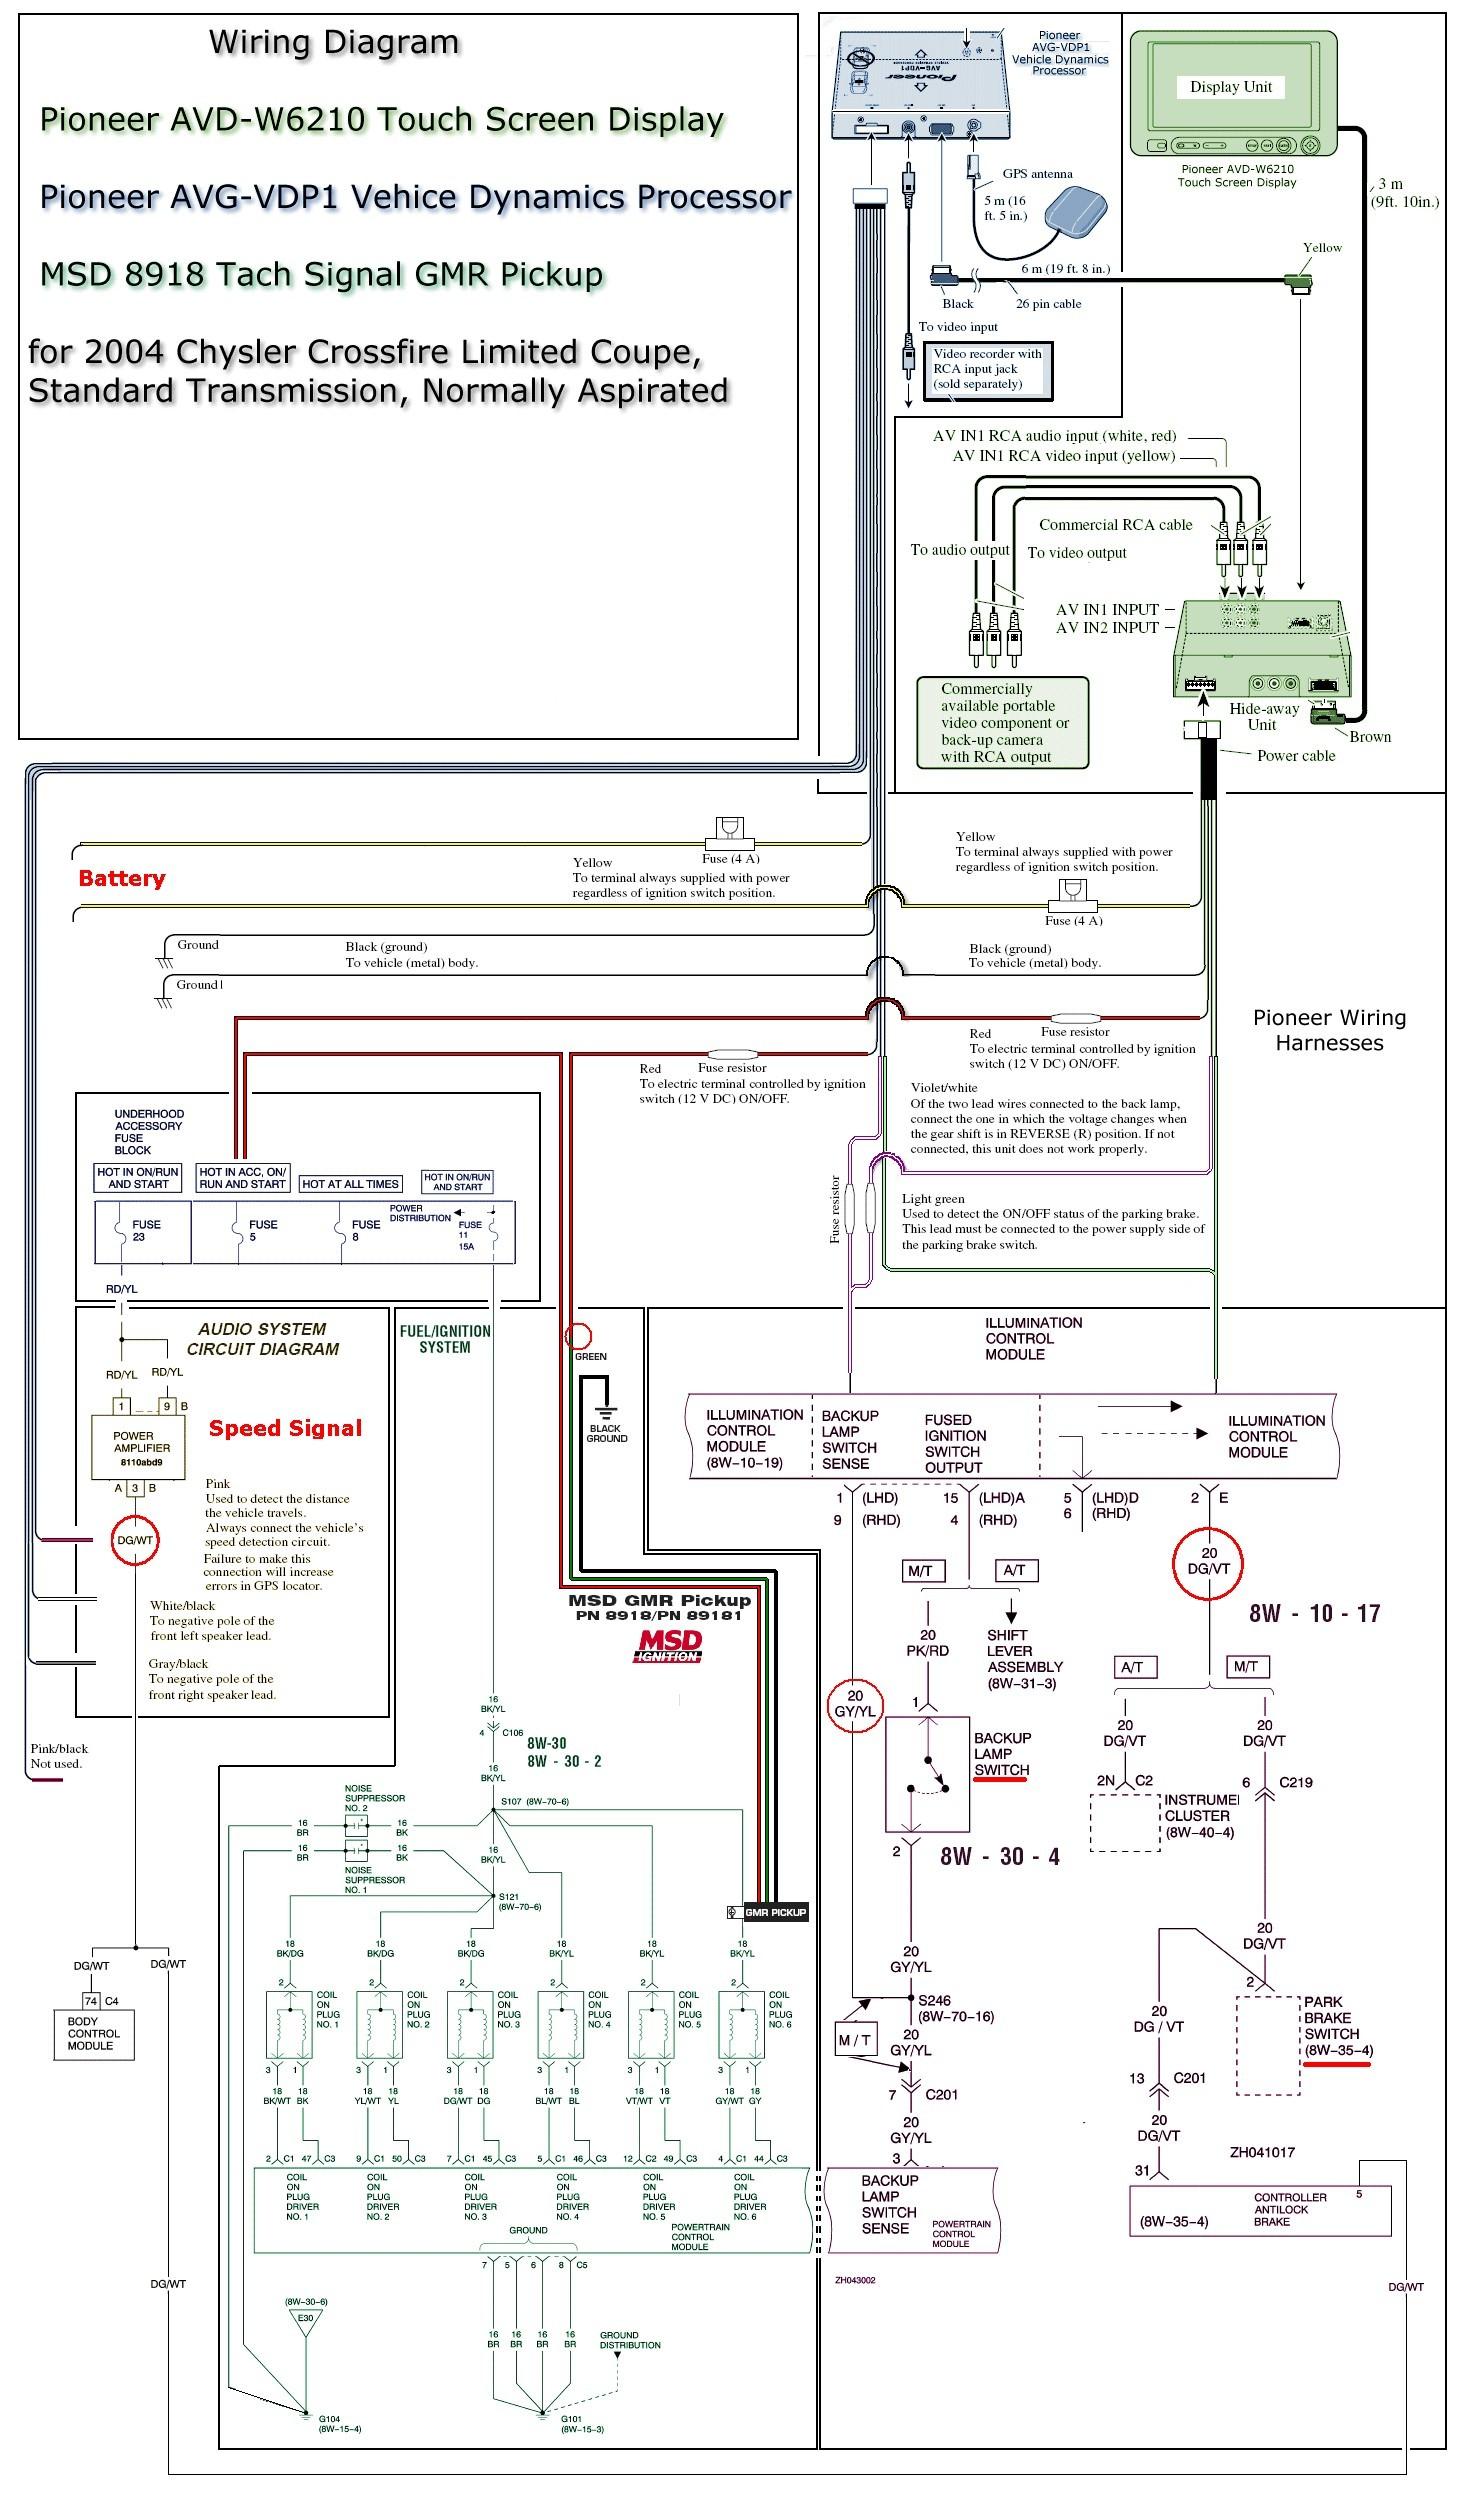 Pioneer Avh-x2800bs Wiring Diagram Awesome   Wiring Diagram Image